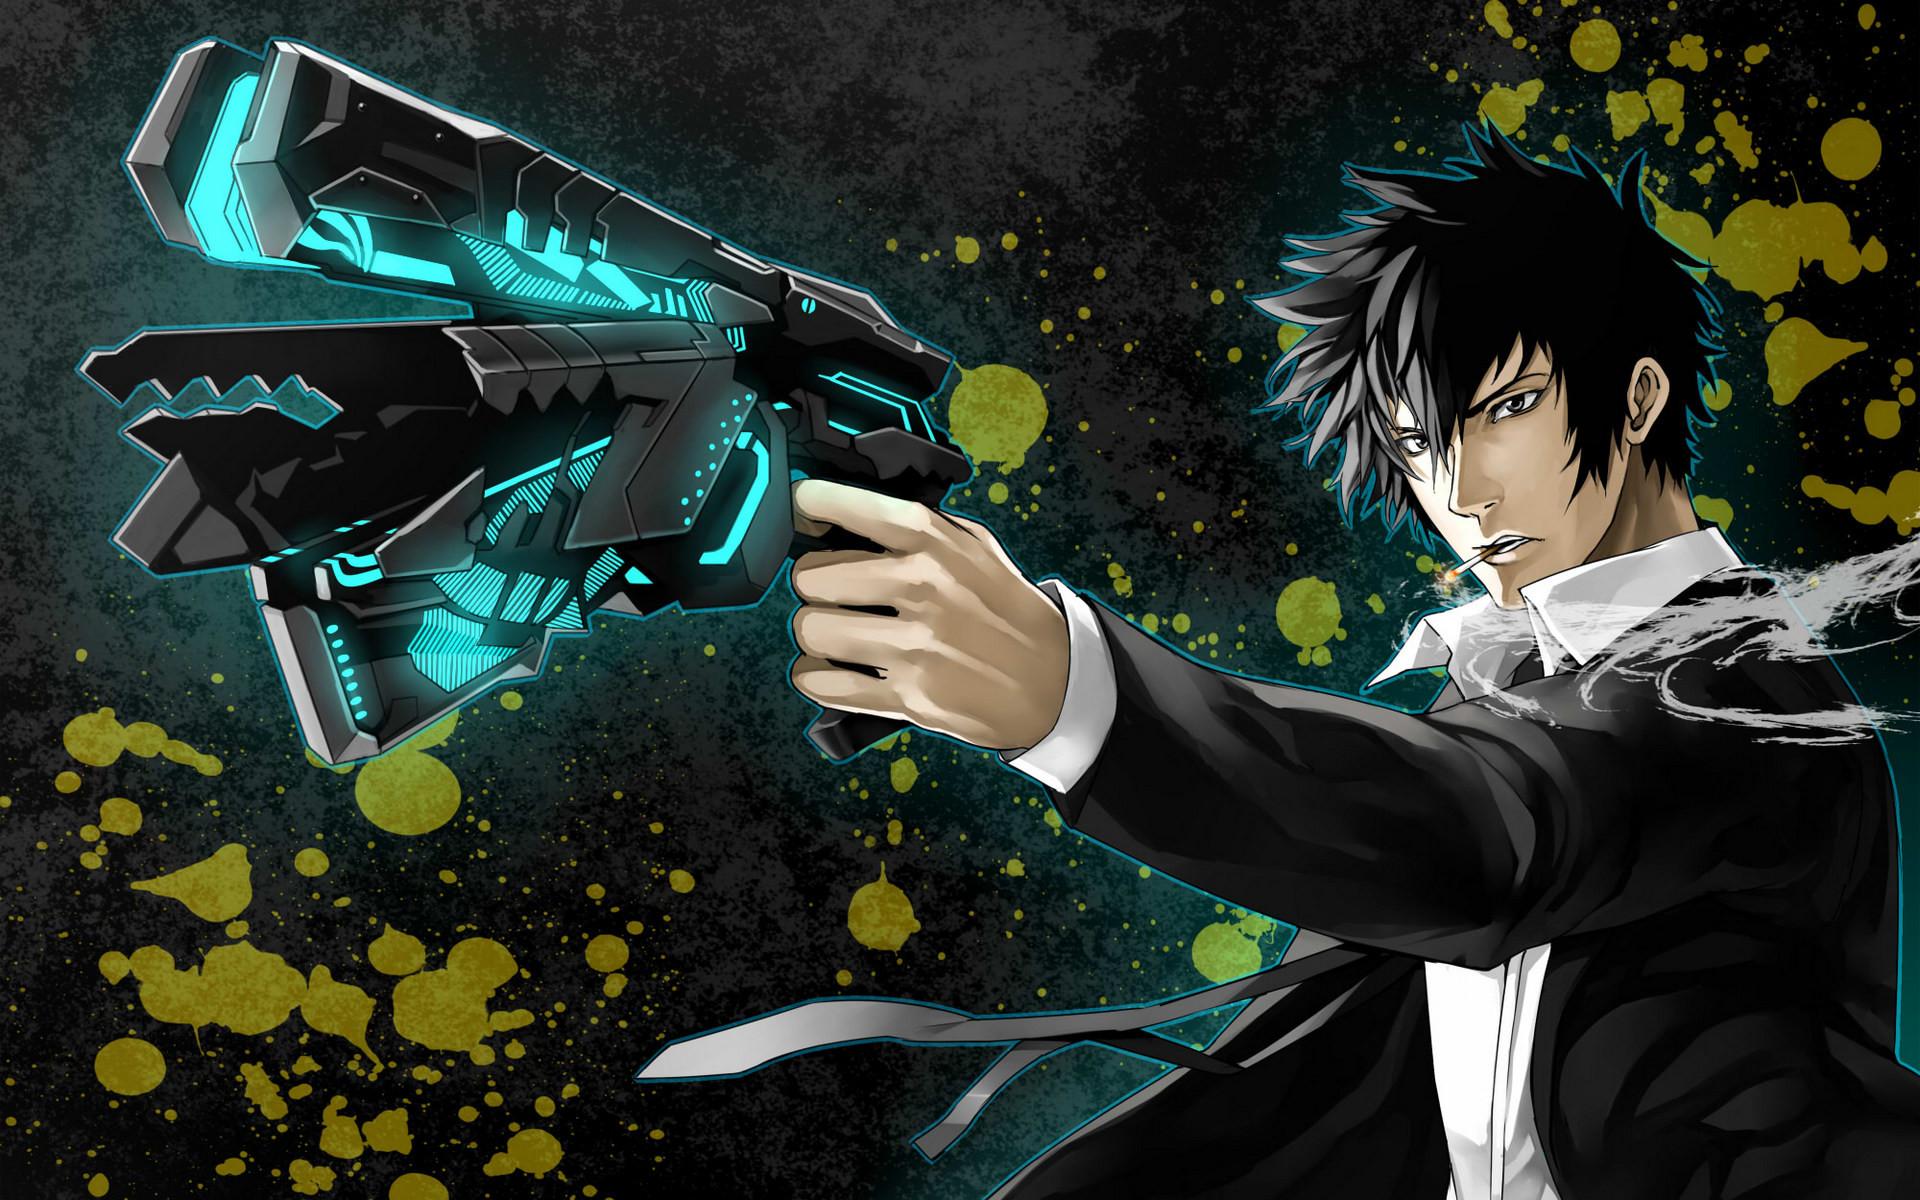 Anime – Psycho-Pass Shinya Kogami Anime Gun Smoking Wallpaper